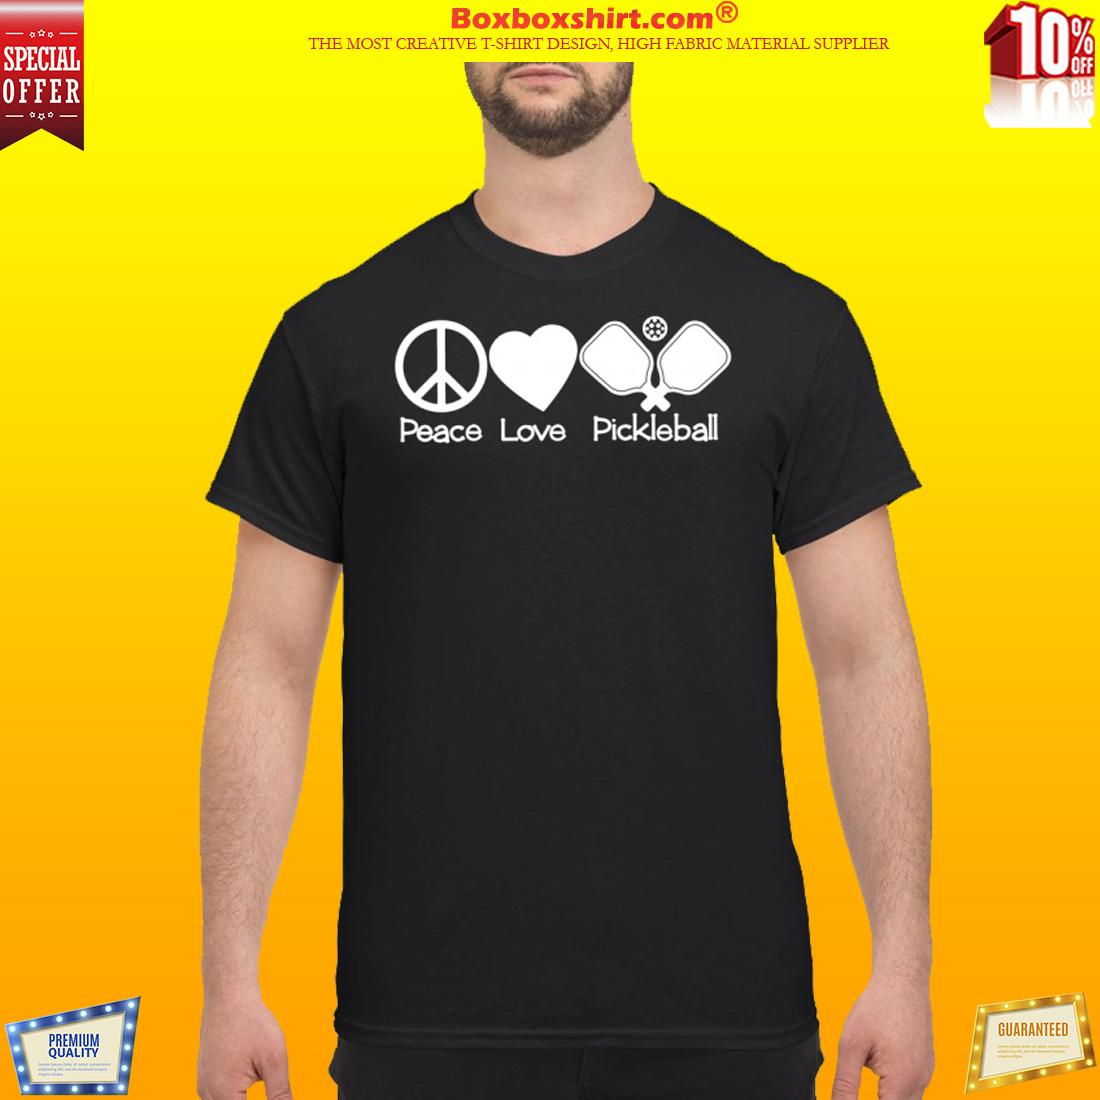 Peace love pickleball classic shirt